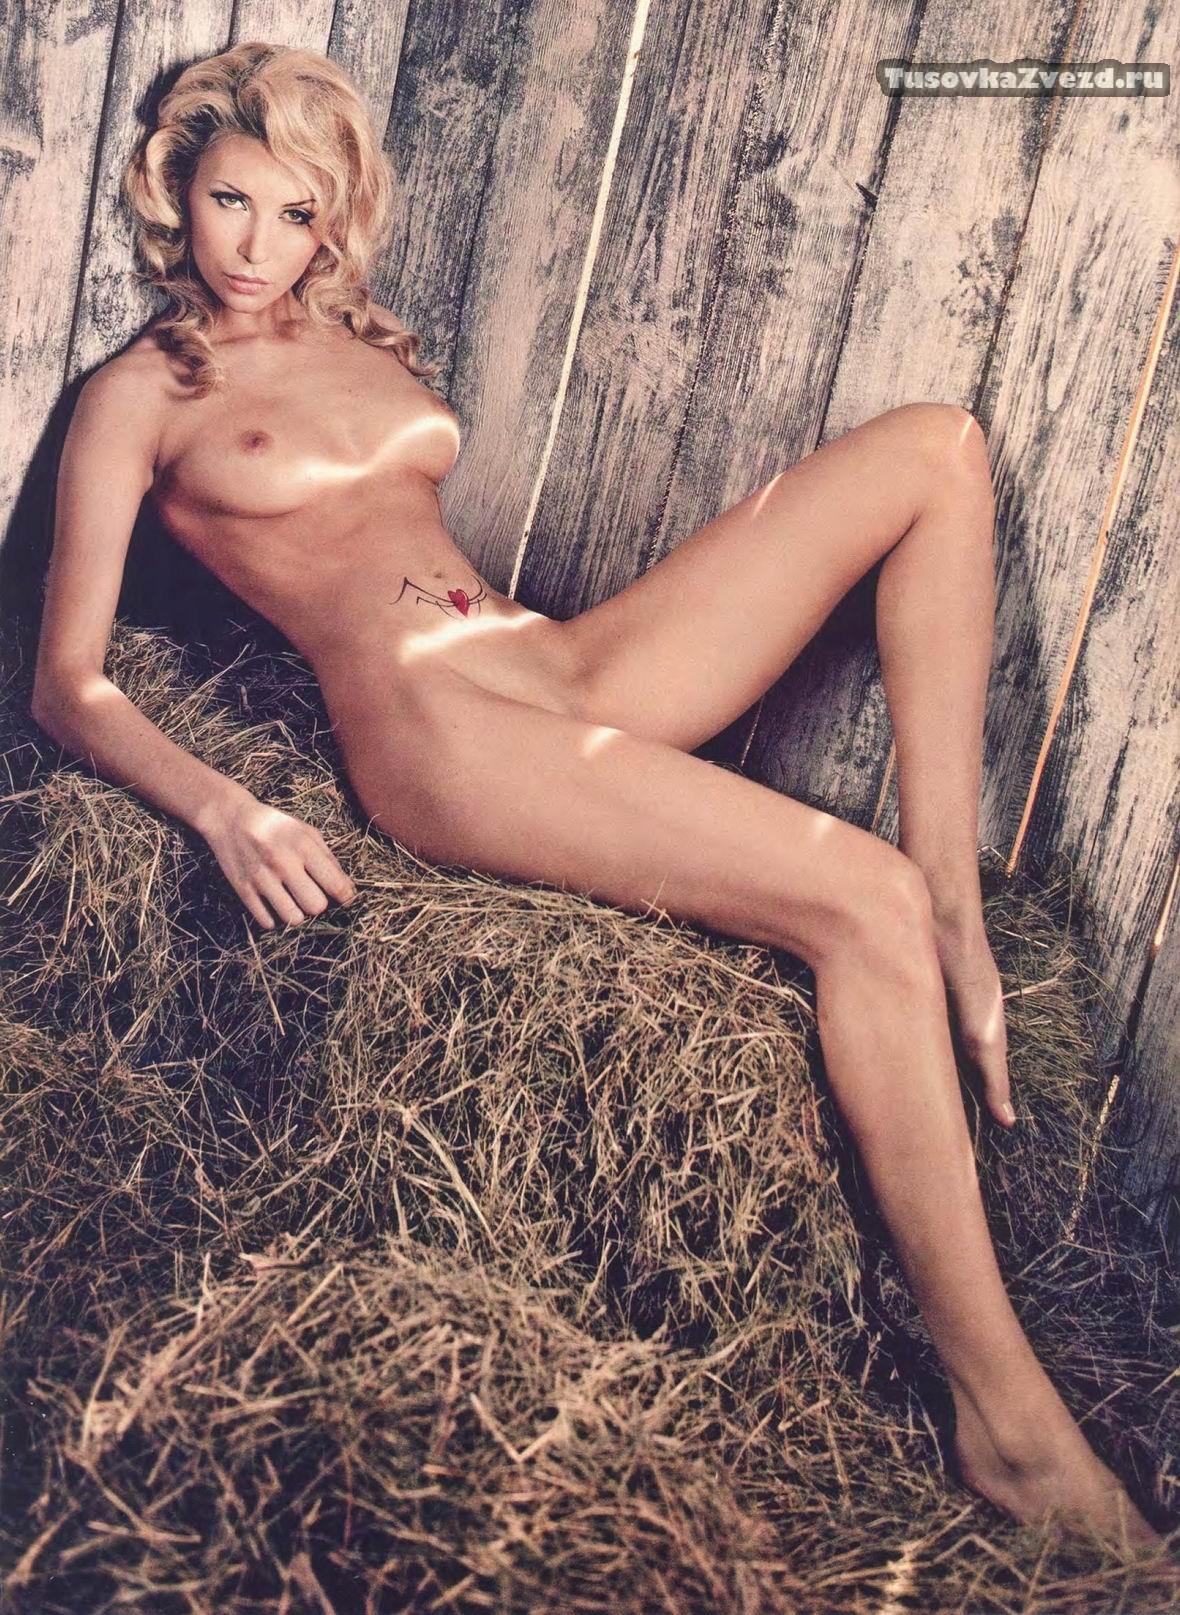 Элина карякина порно фото